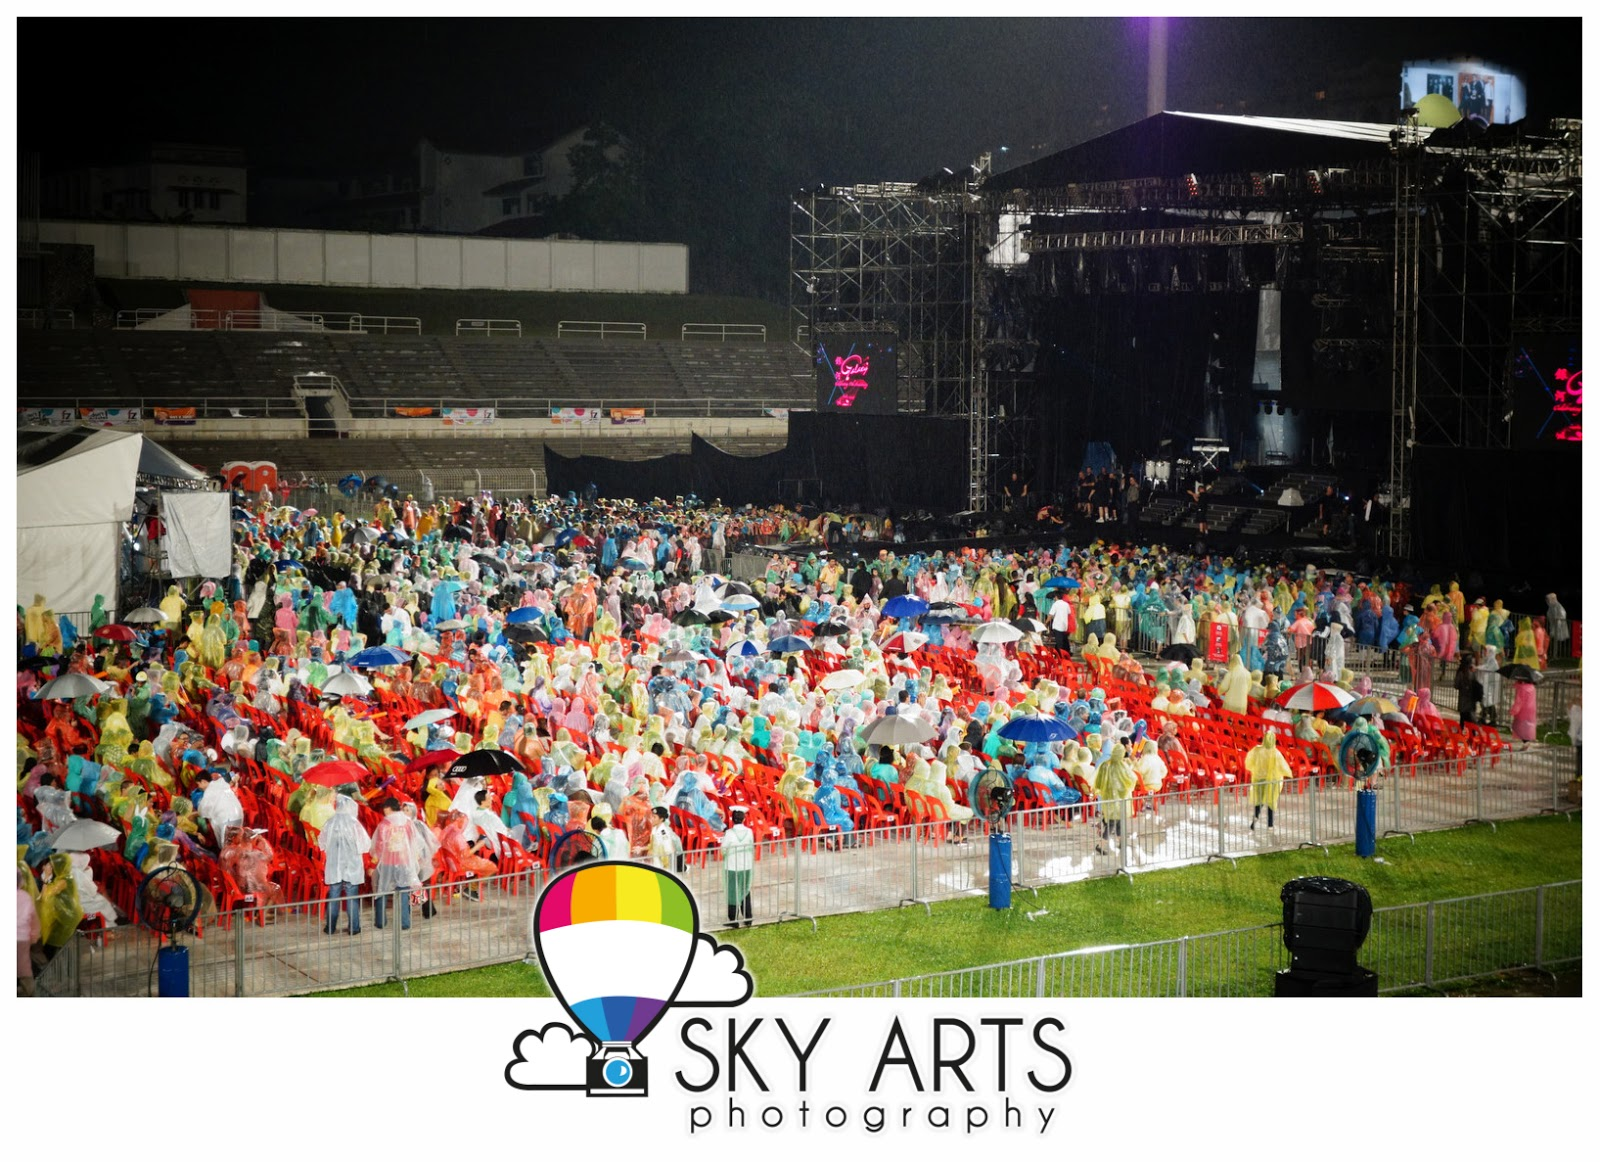 http://3.bp.blogspot.com/-B6goldaO3N0/ULwNEAGl0NI/AAAAAAABqok/sXNLsy9jcmY/s1600/Jennifer+Lopez+%23DanceAgainWorldTour2012+Malaysia+Kuala+Lumpur+Live+Concert-00343.jpg